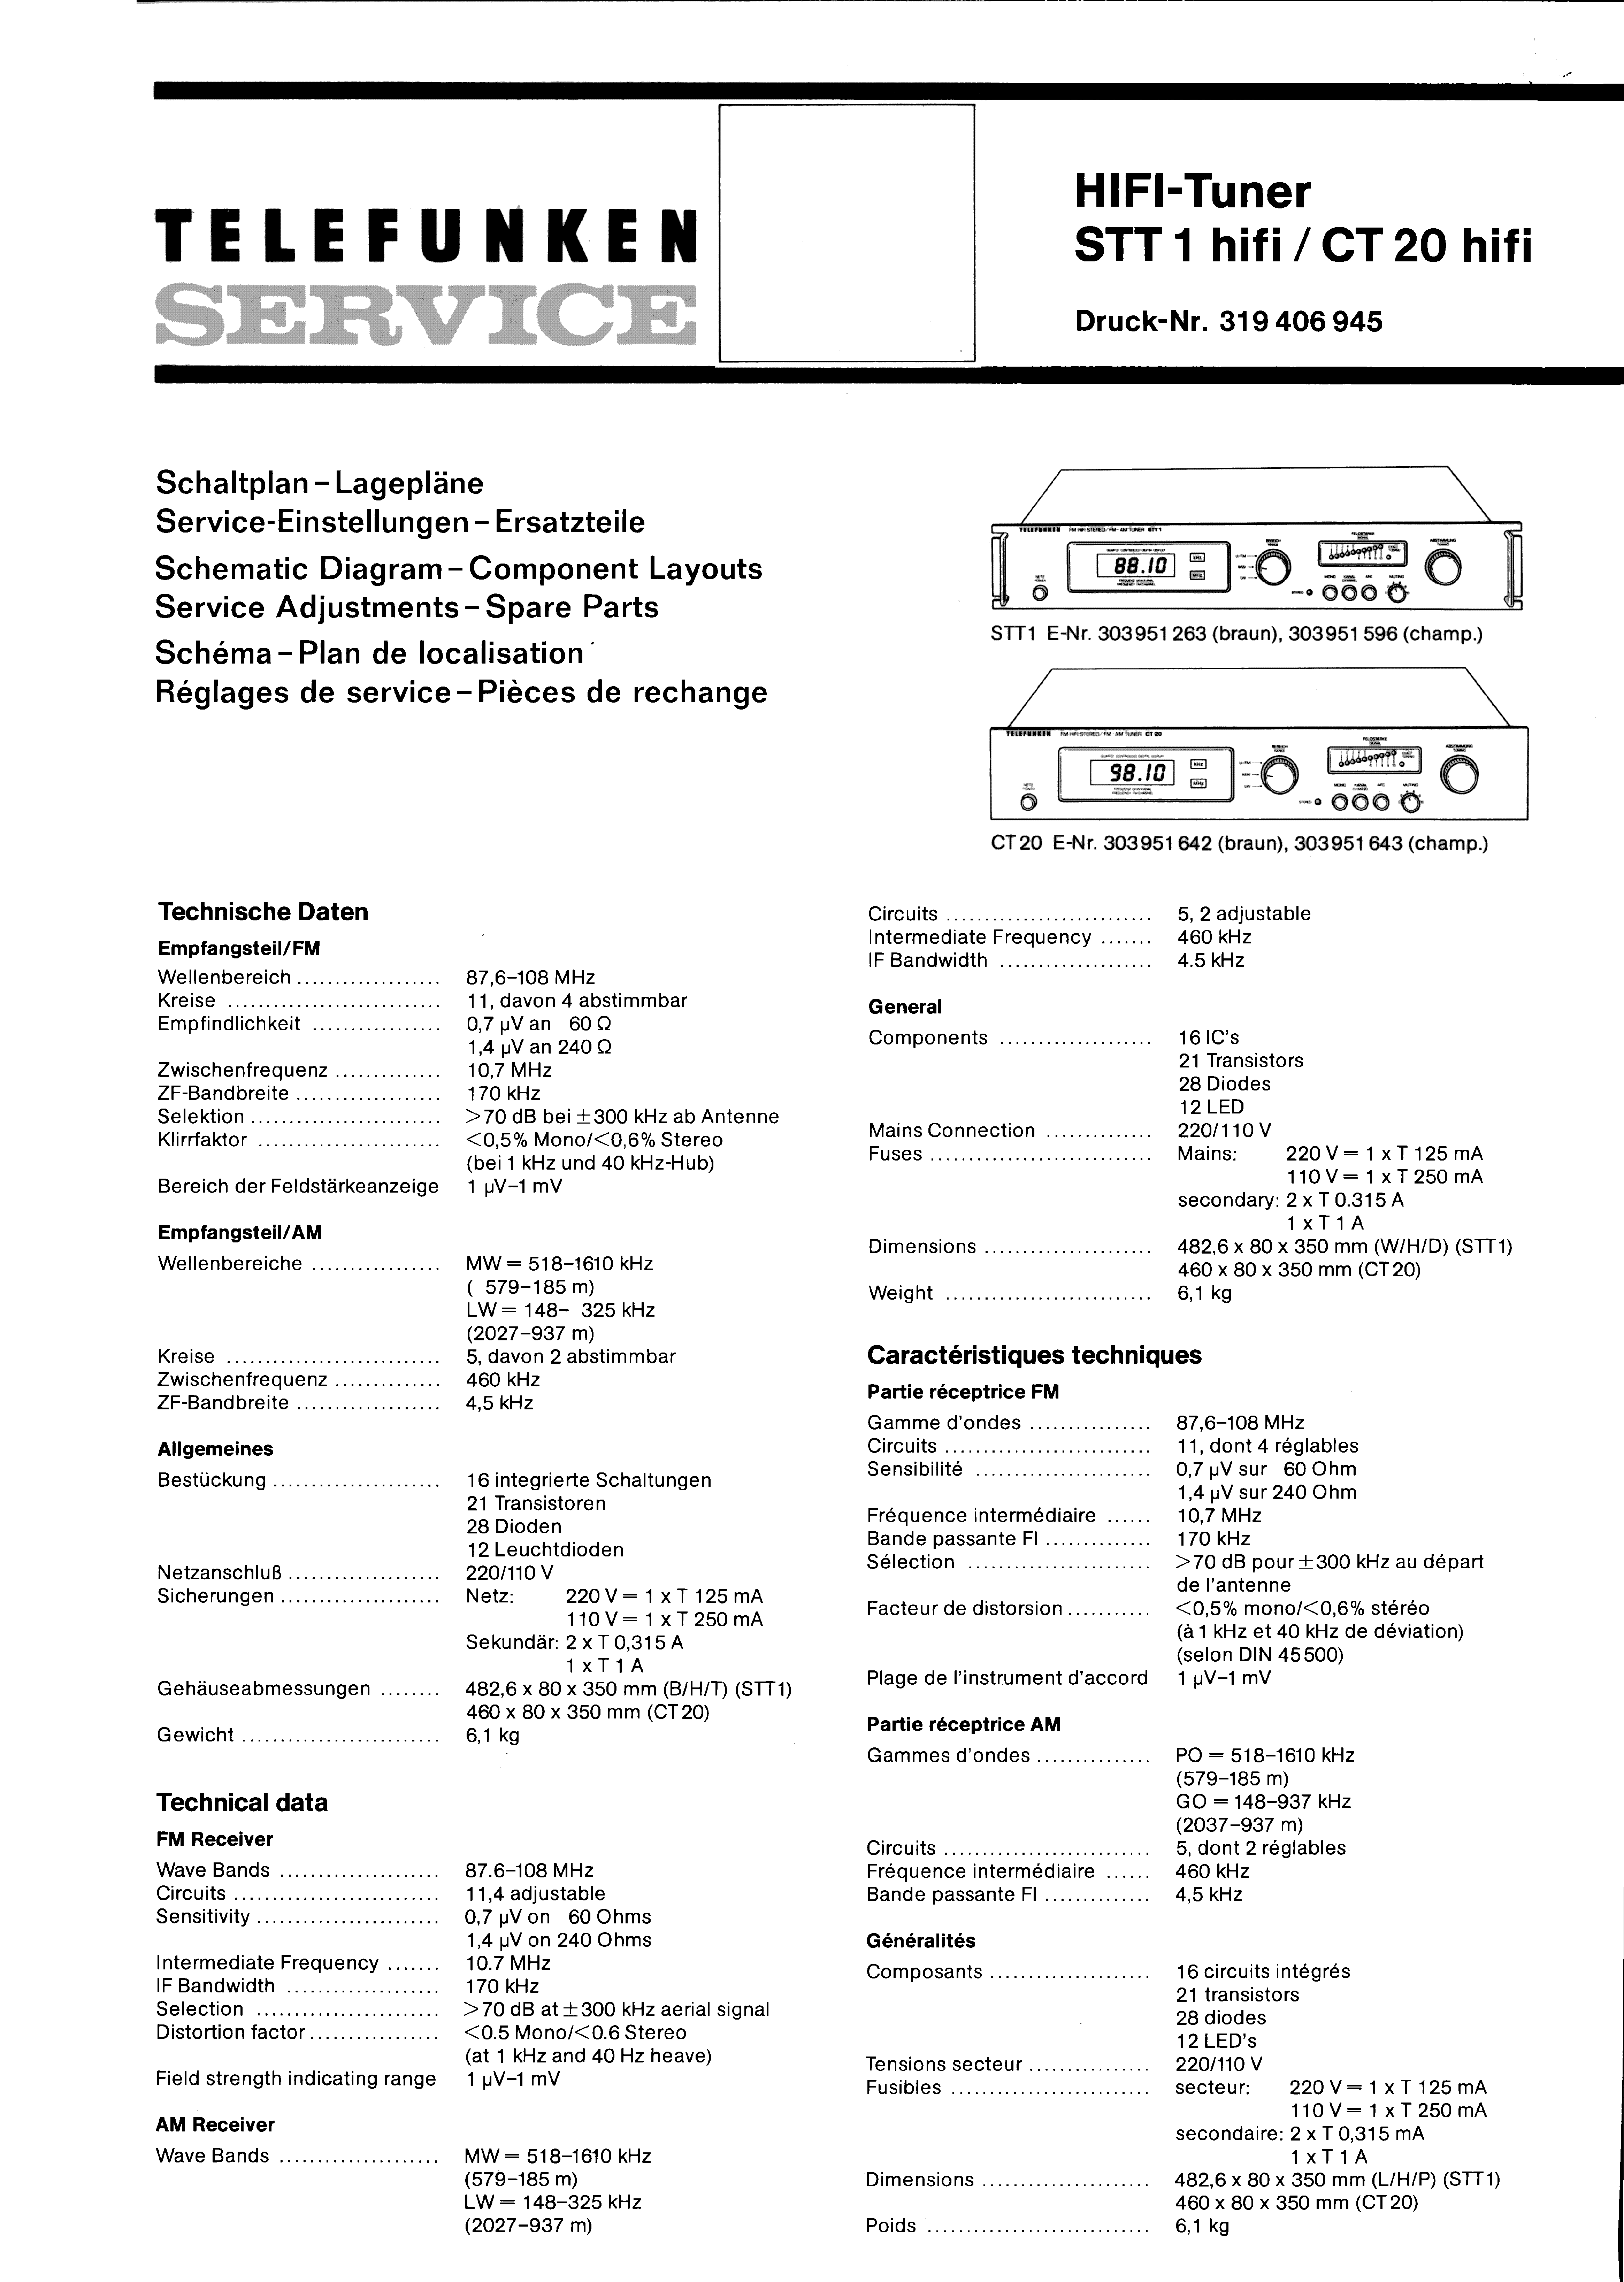 TELEFUNKEN HIFI-TUNER STT 1 HIFI CT 20 HIFI SM service manual (1st page